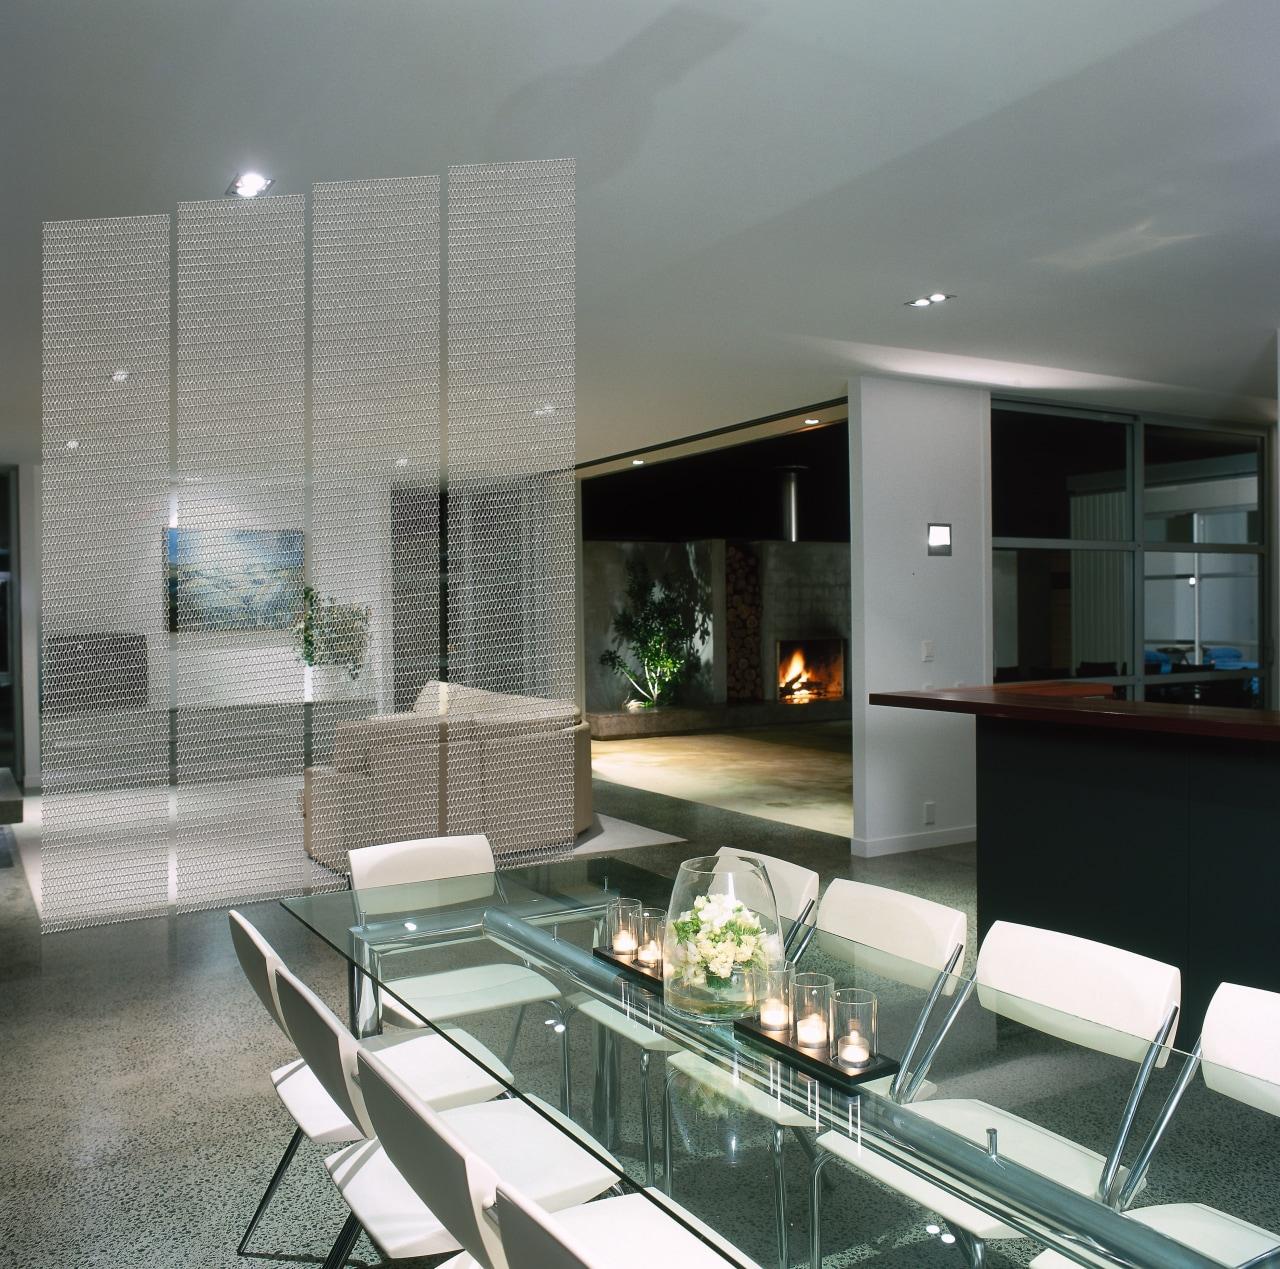 A dining area featuring designer mesh. The area architecture, condominium, glass, interior design, real estate, window, gray